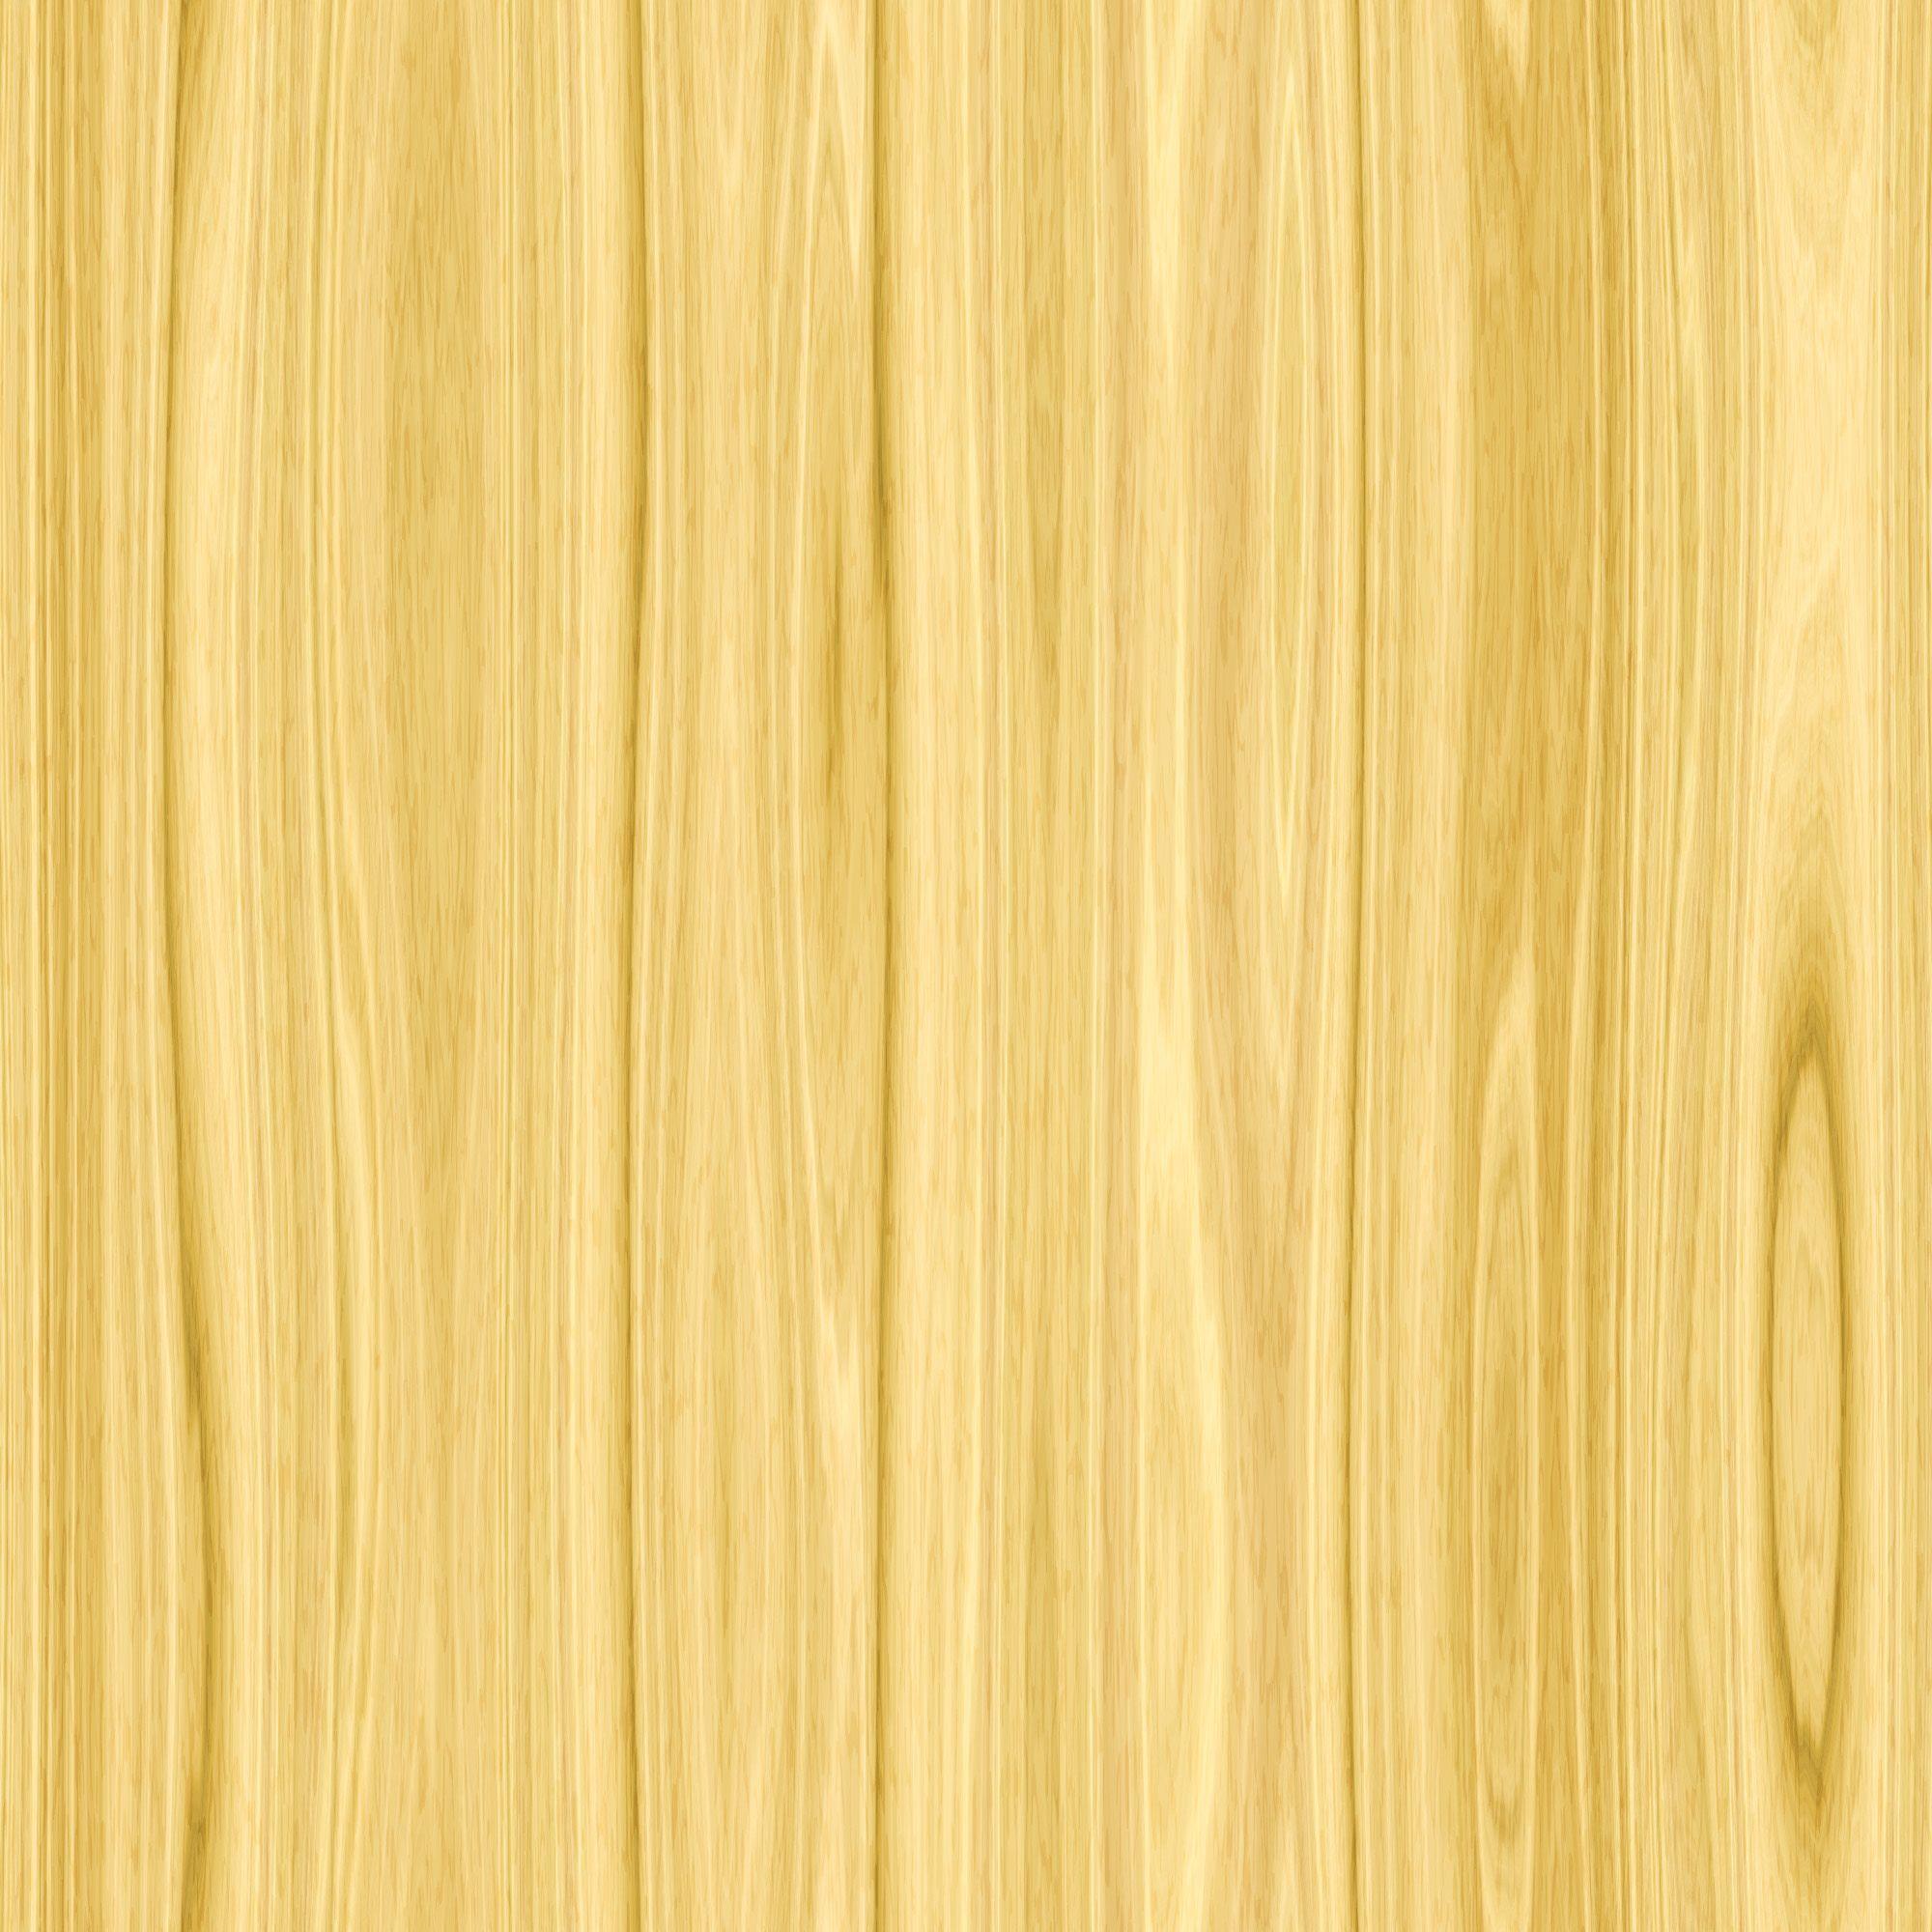 Pics photos wood texture background - Seamless Wood Texture Nice Light Pine Wooden Background Http Www